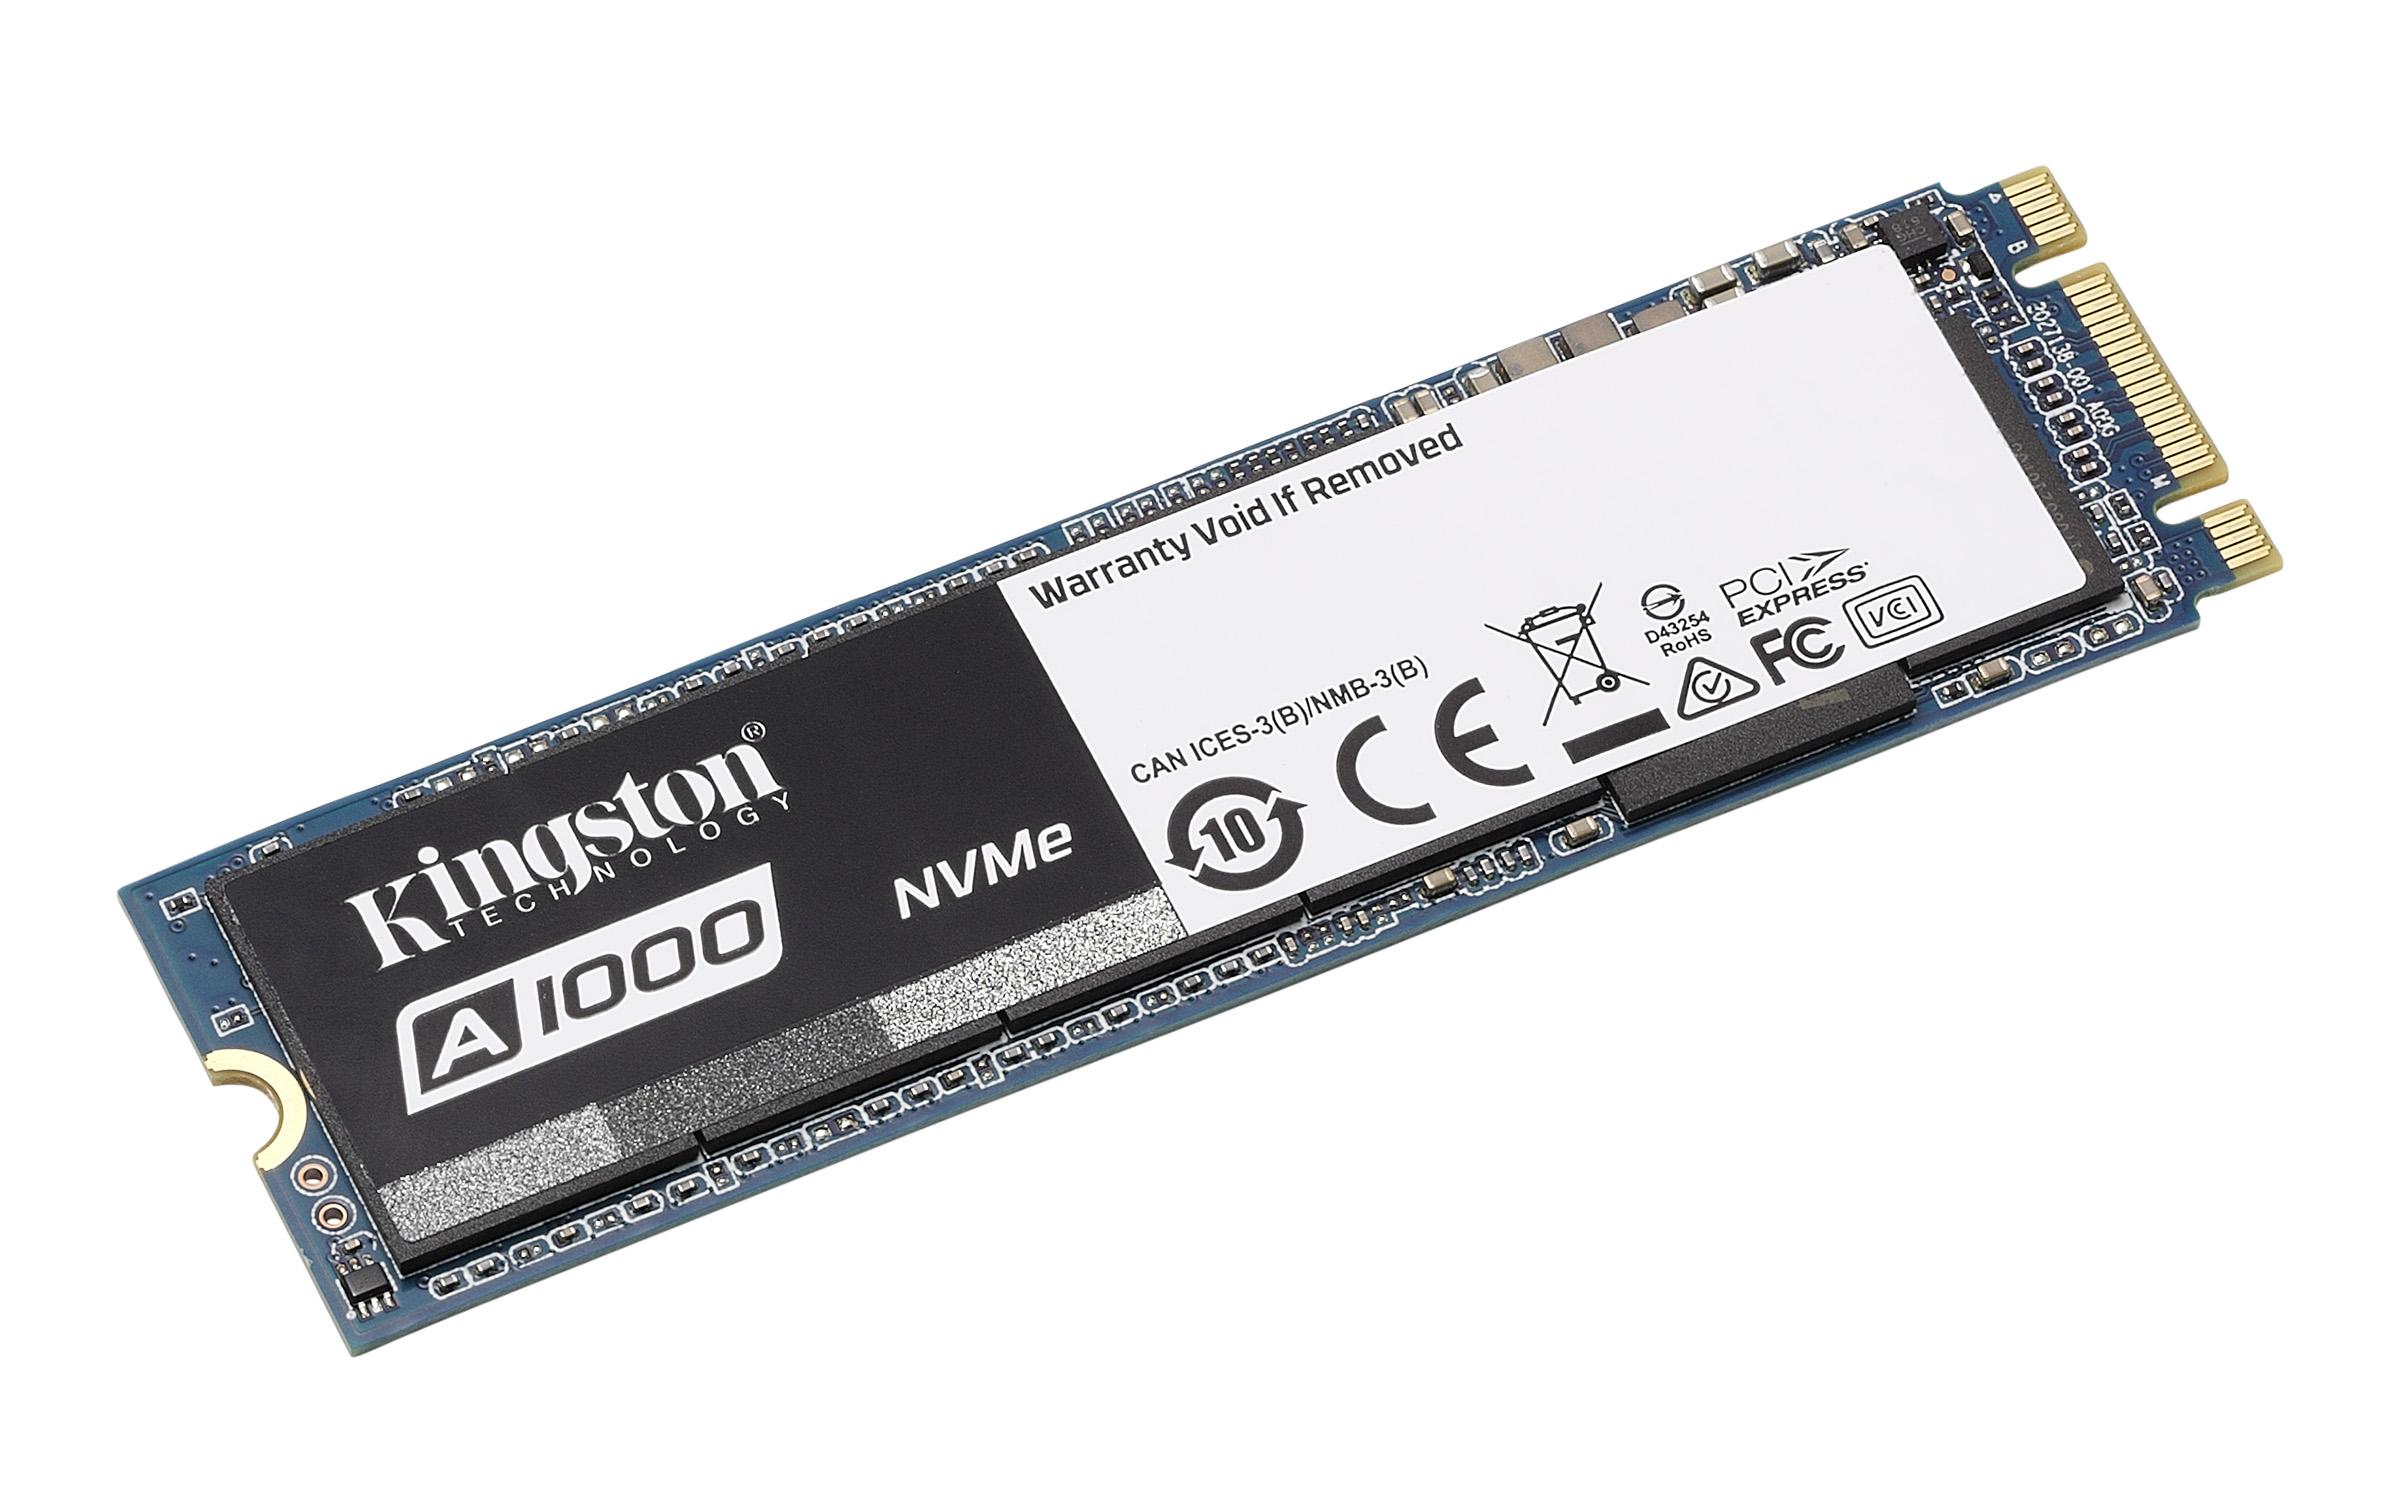 A1000 NVMe PCIe SSD – 240GB-960GB | Kingston